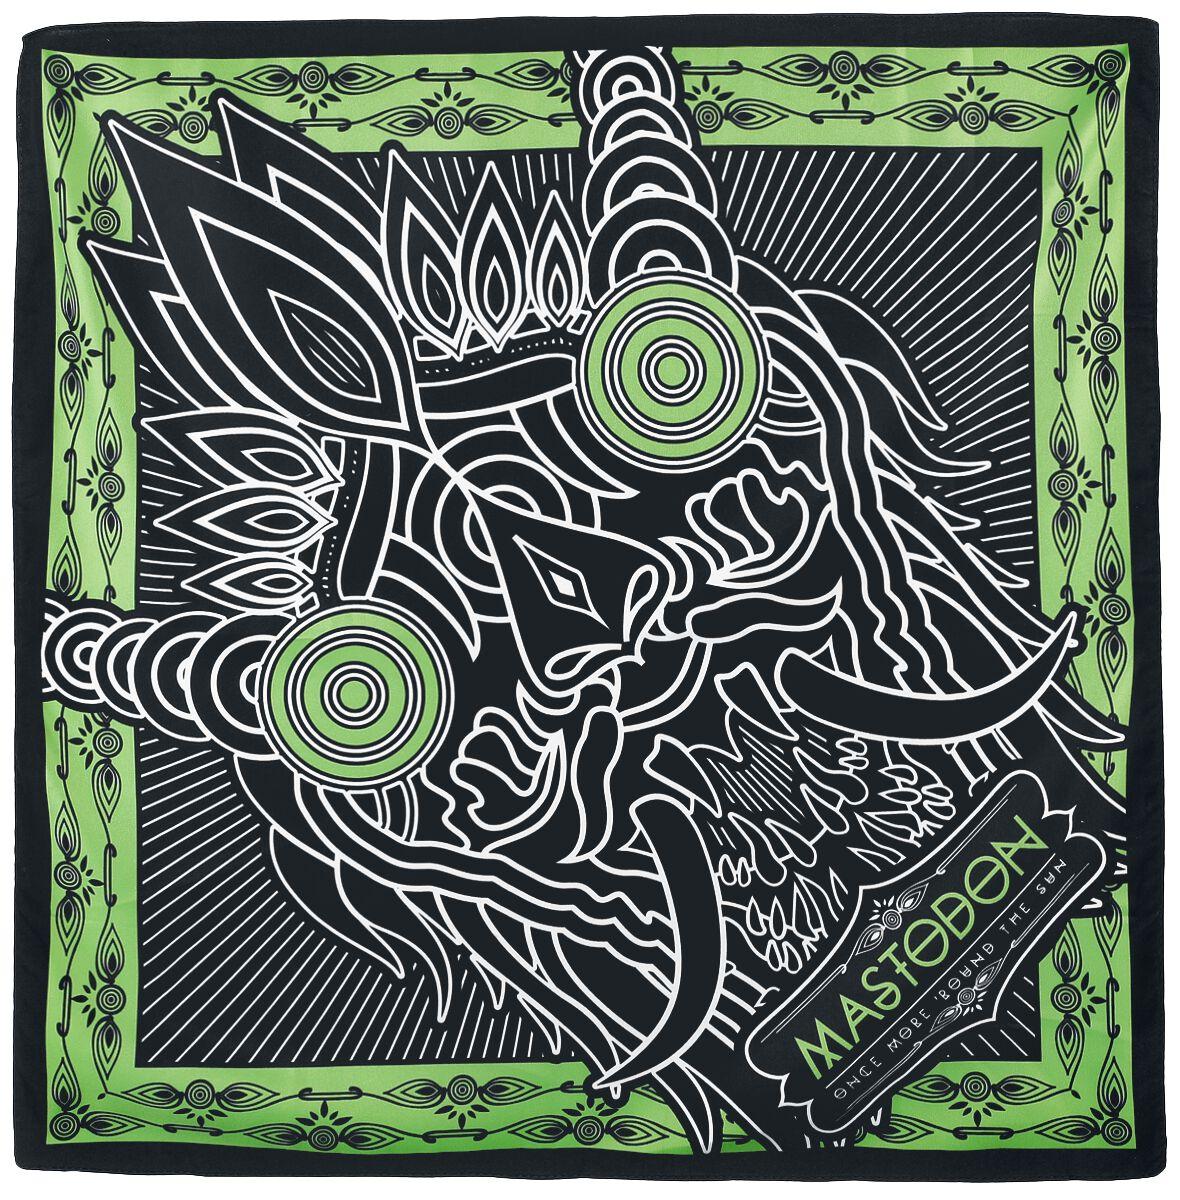 Mastodon Creature headline art - Bandana Bandana schwarz grün